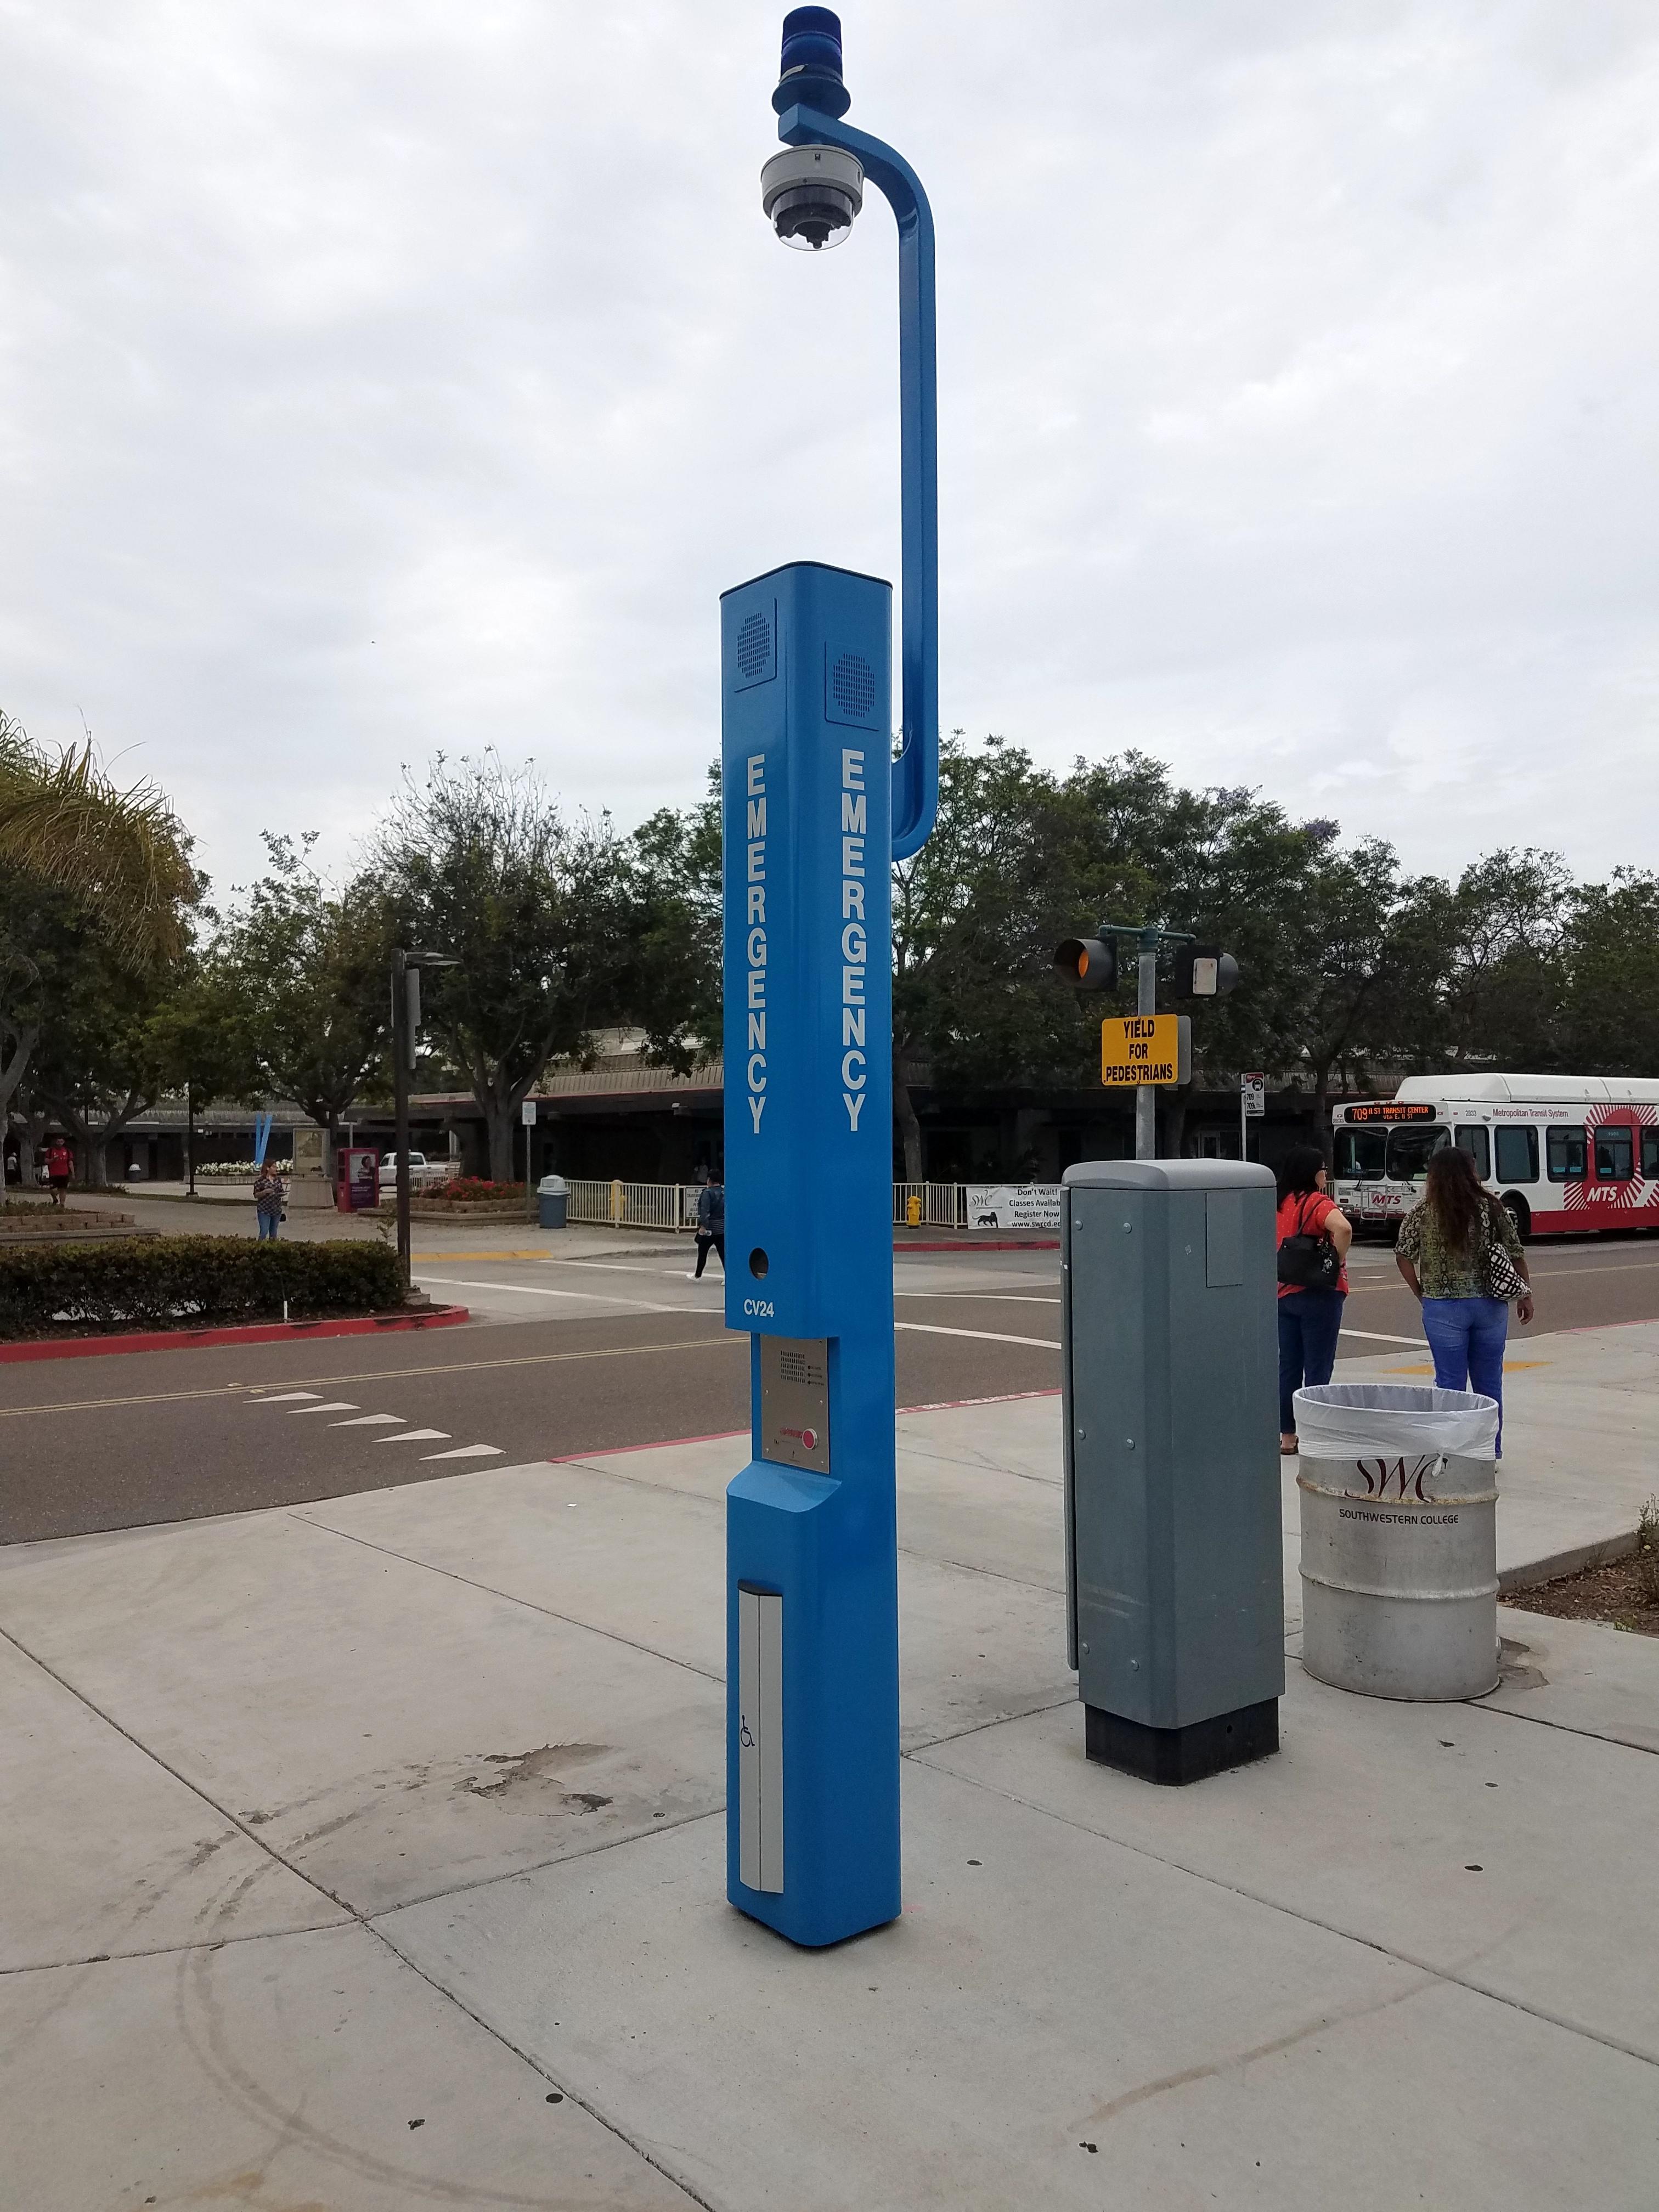 Southwestern College, Chula Vista, California